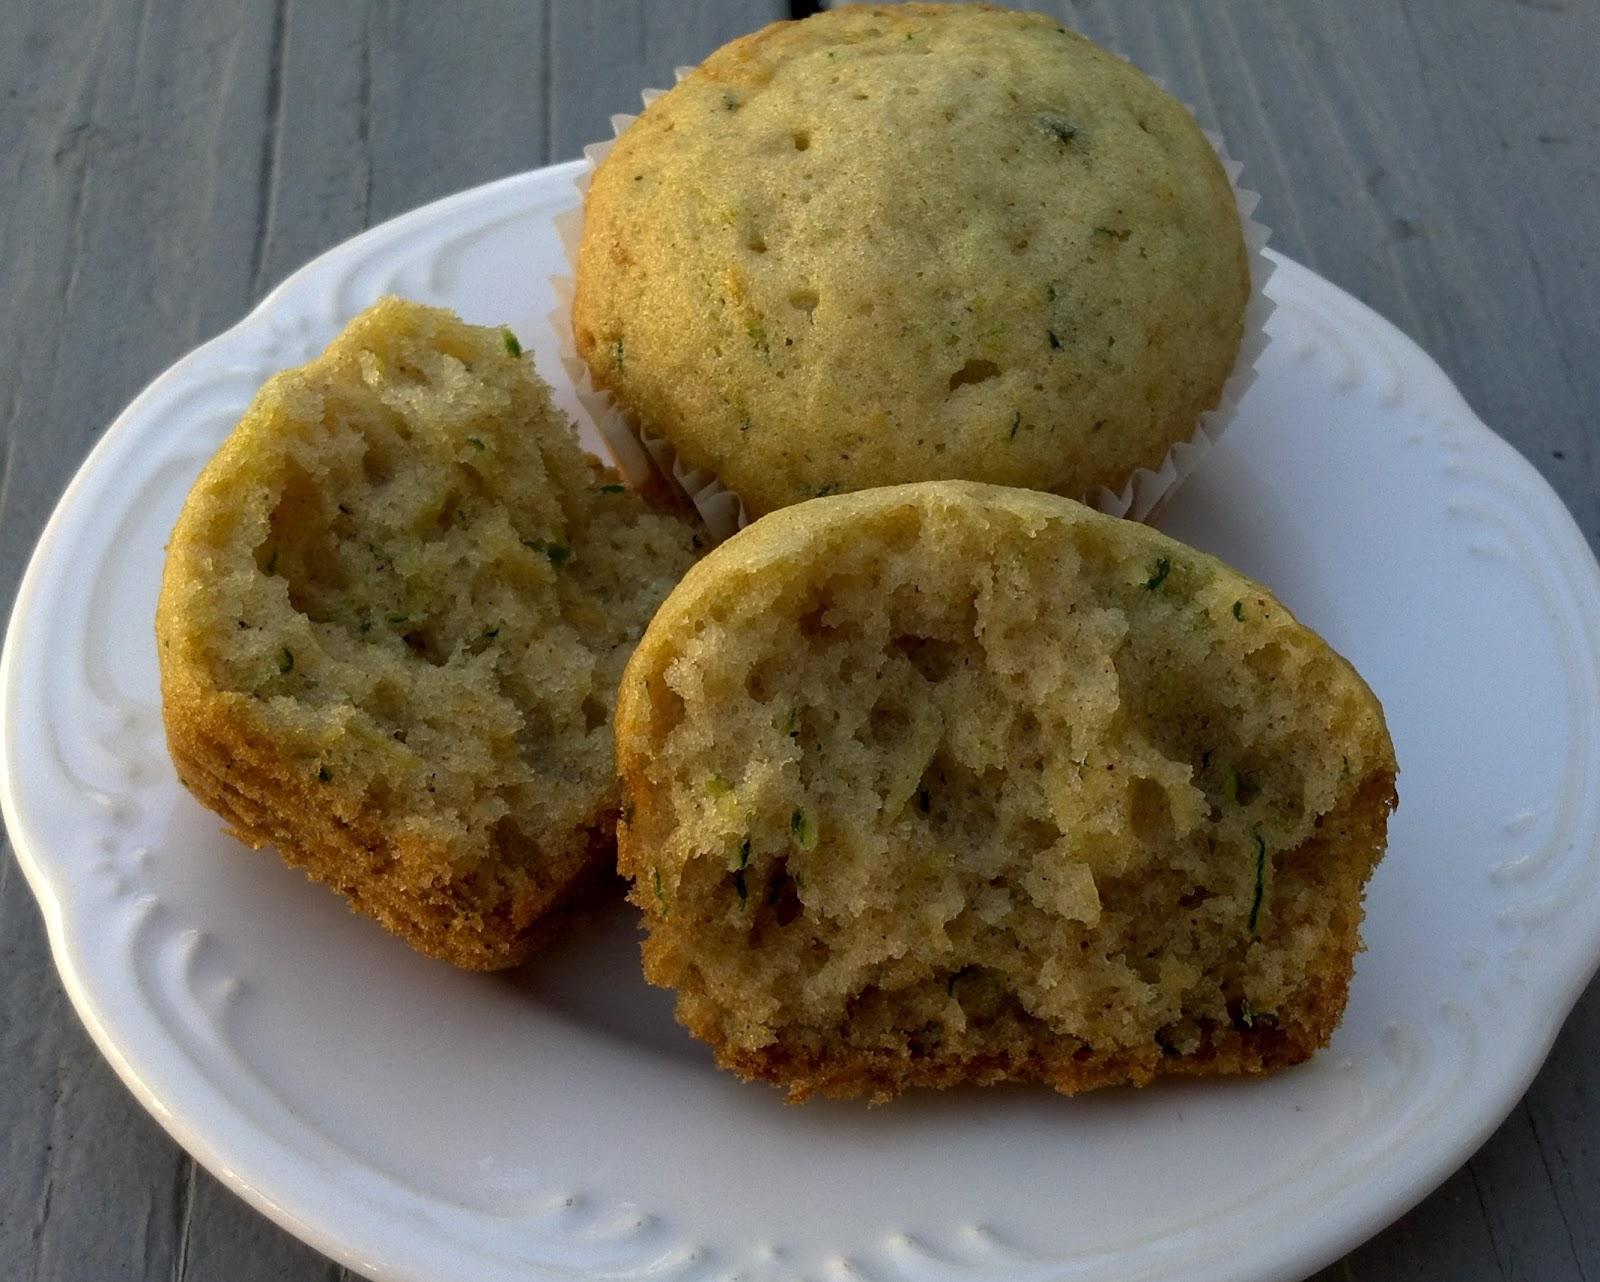 Zucchini Spice Muffins (or Carrot Spice Muffins)